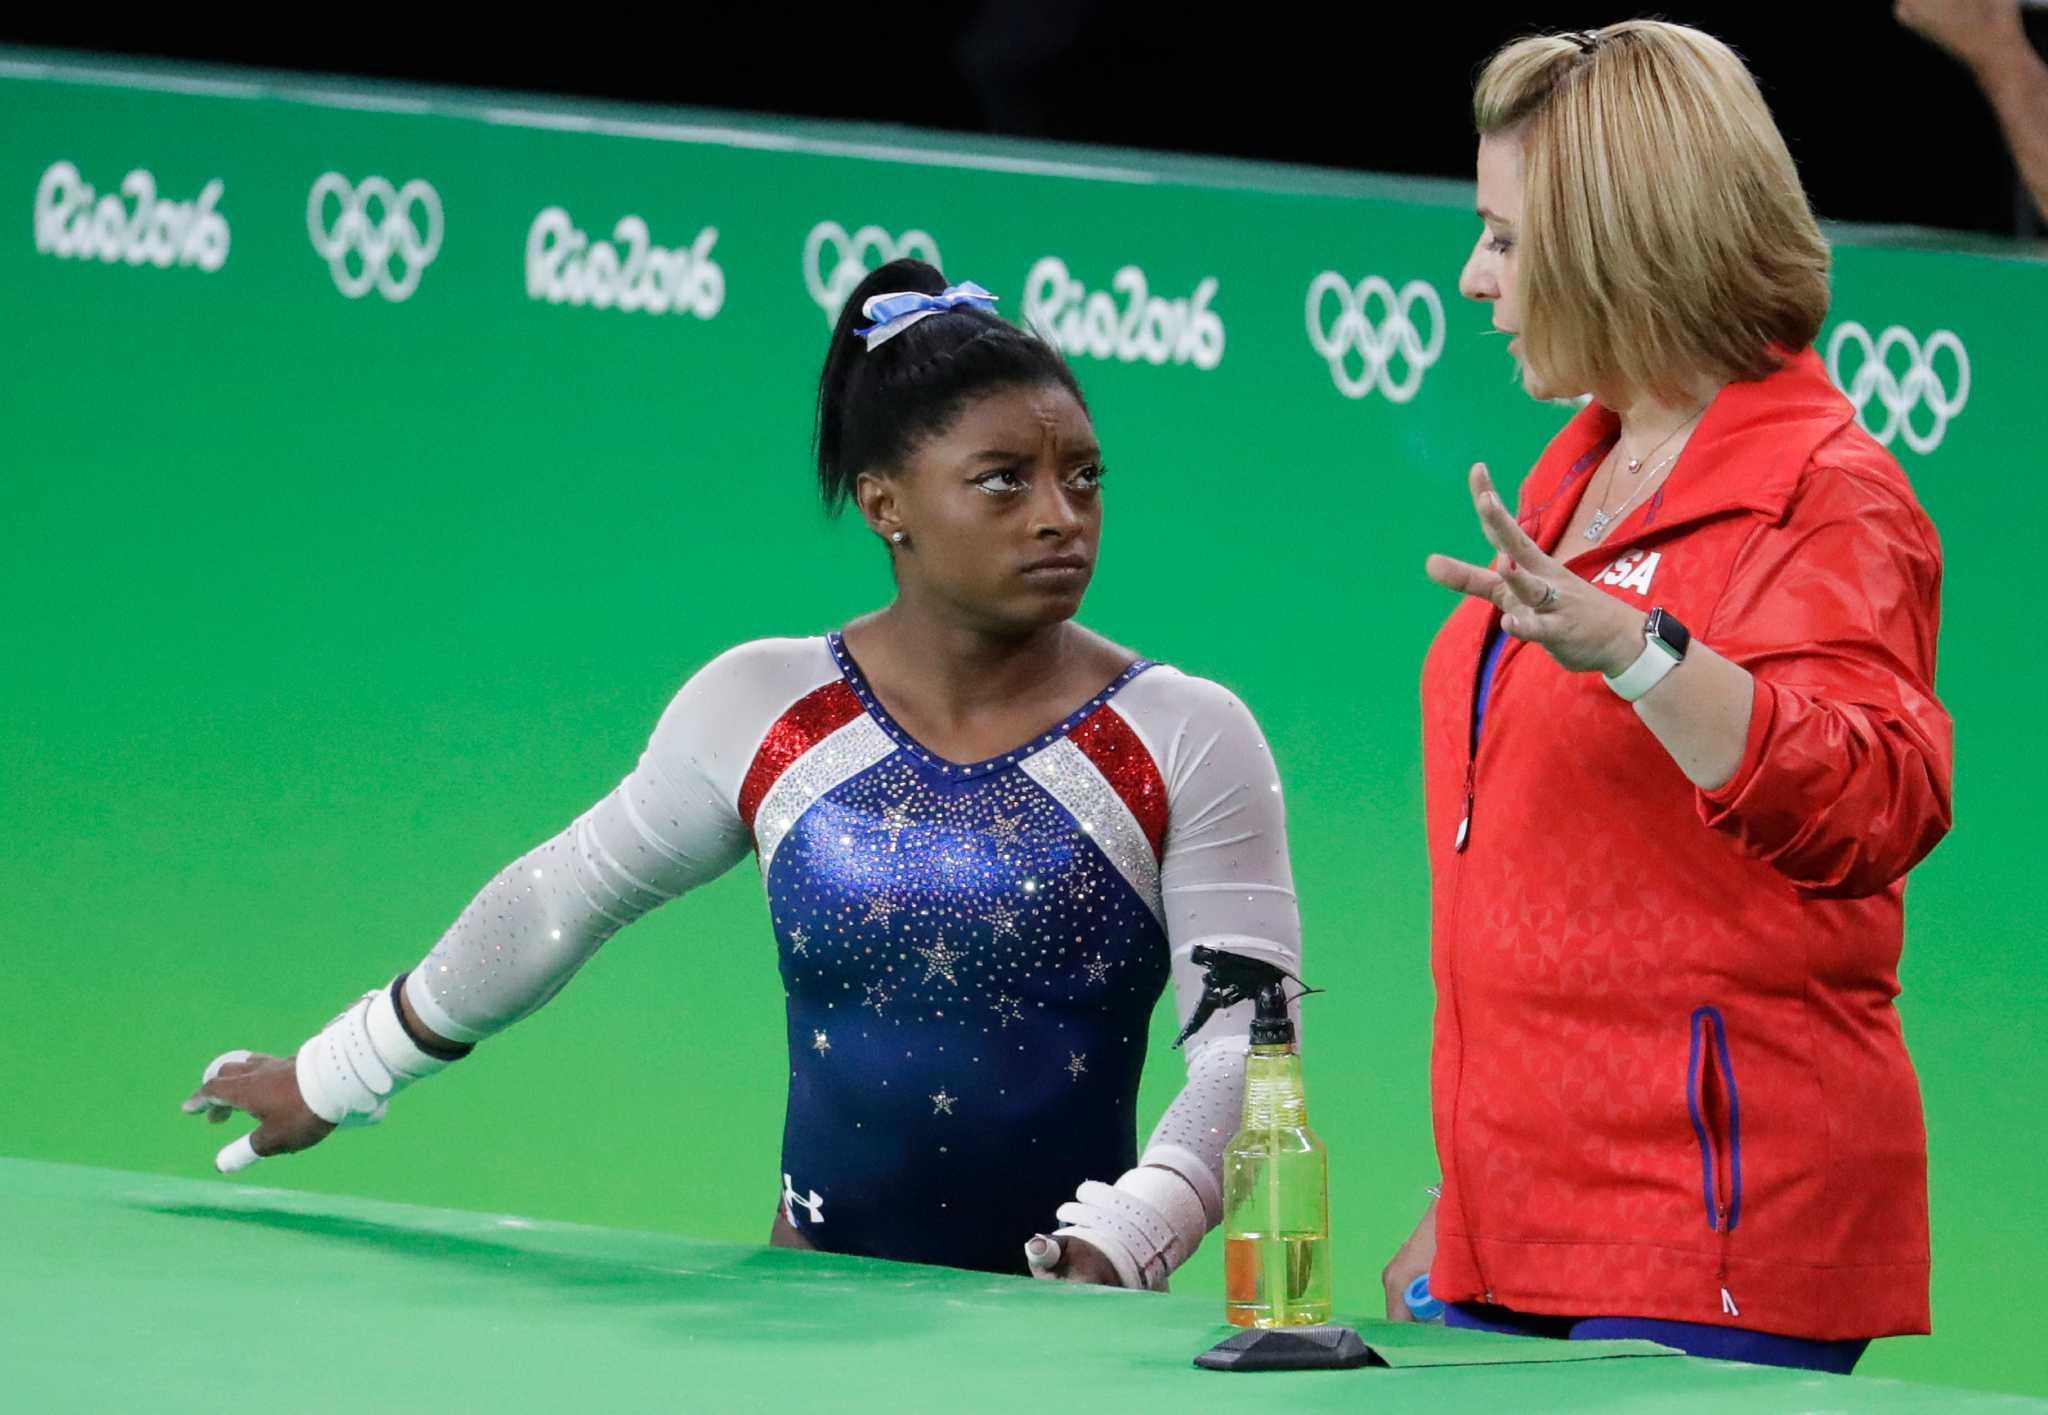 Gymnastics Coaches Aimee Boorman Kim Zmeskal Burdette